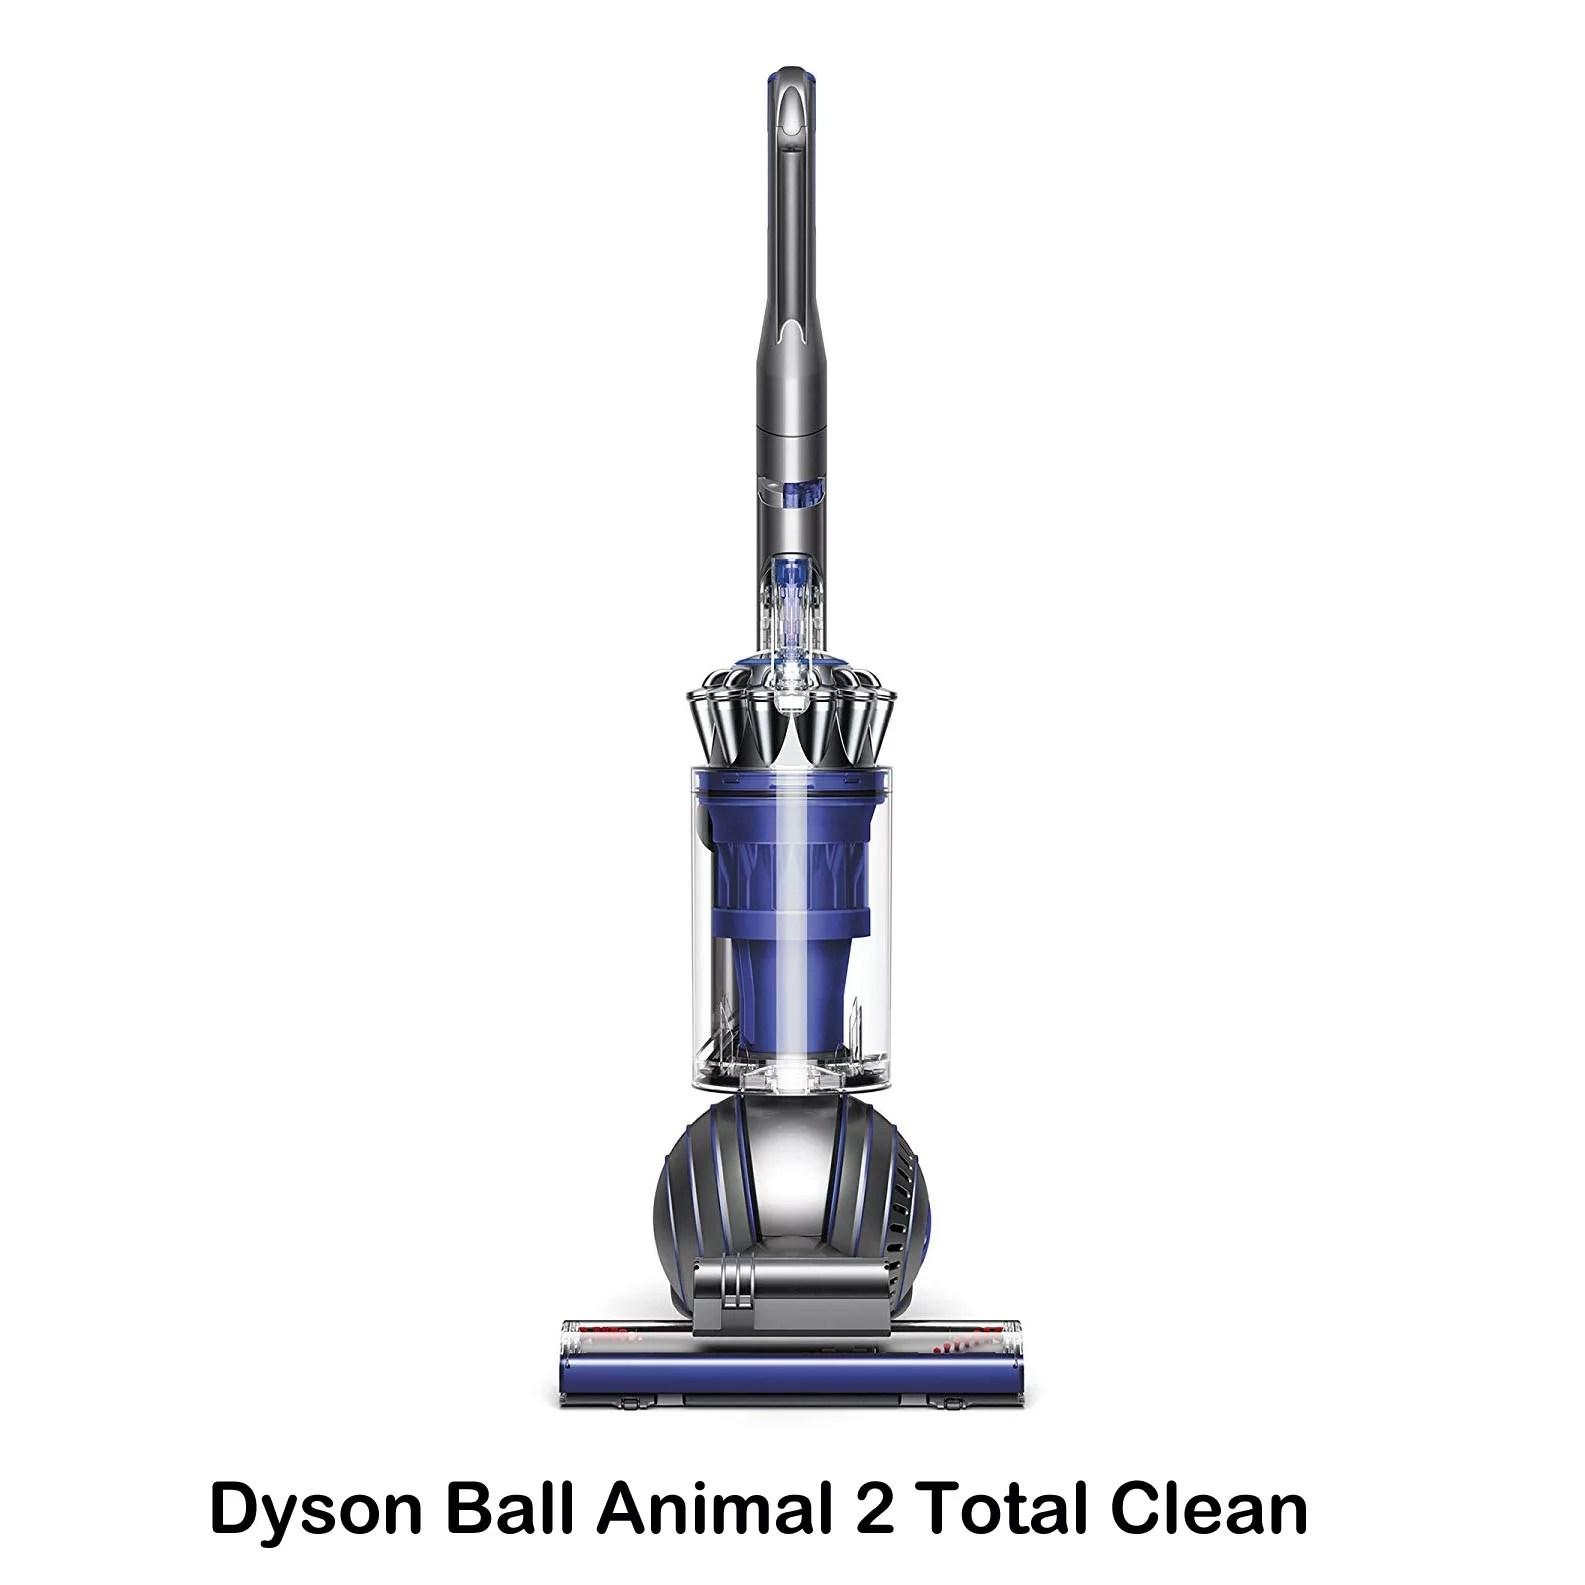 Dyson Ball Animal 2 Total Clean